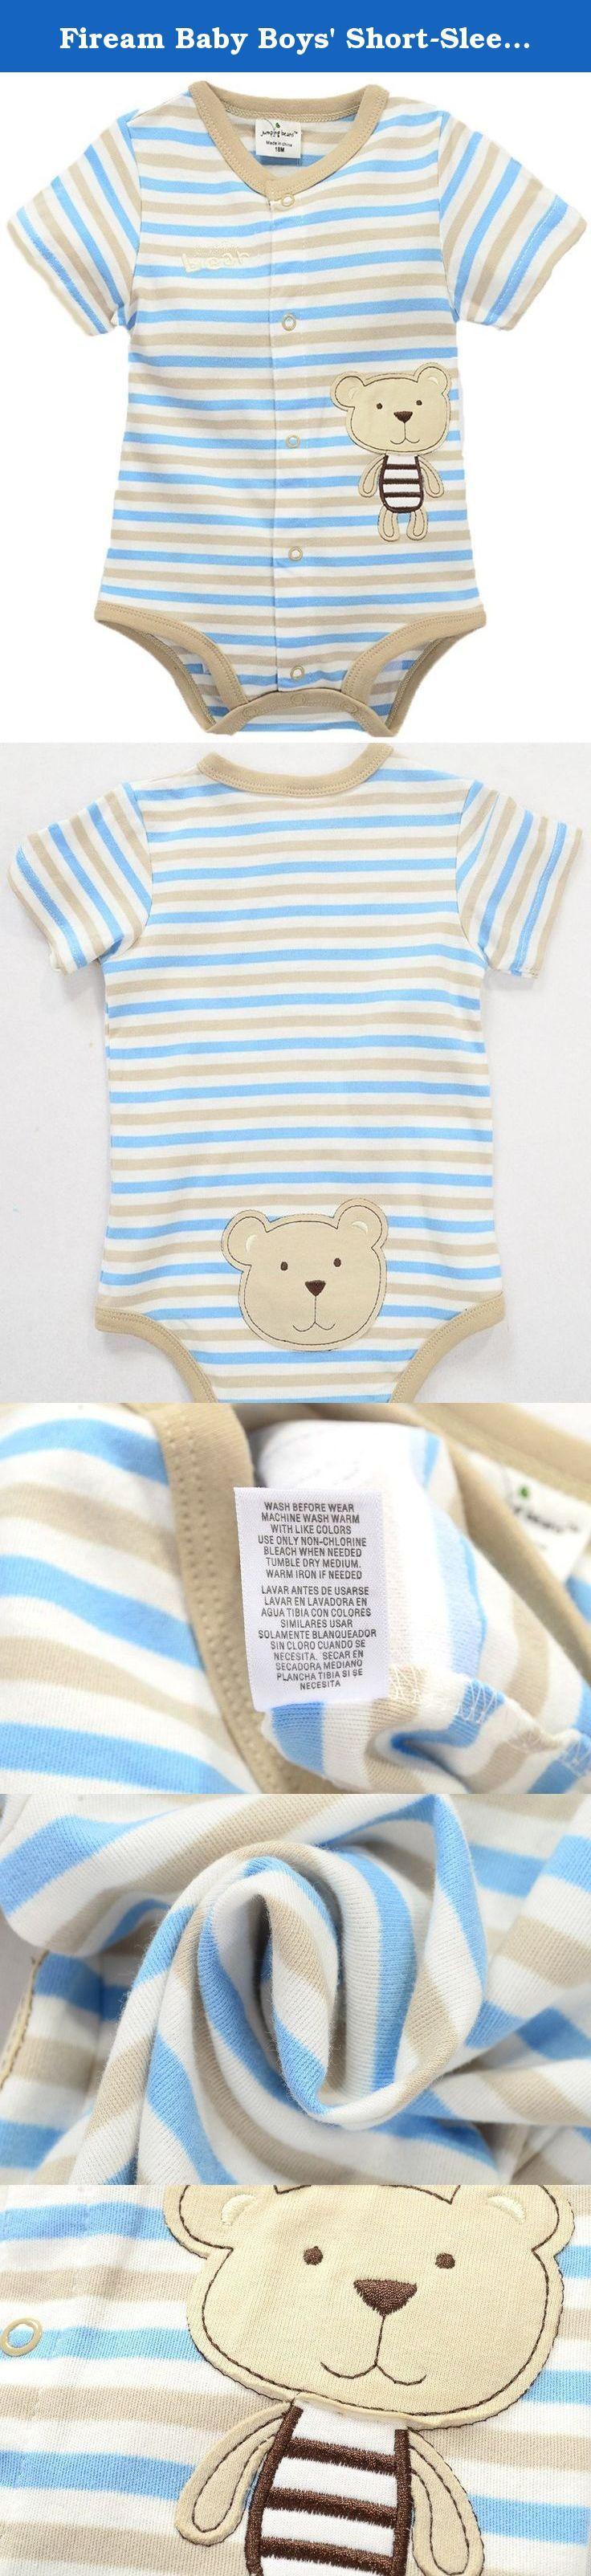 "Fiream Baby Boys' Short-Sleeved Stripe Cotton Bodysuit(9802TZ,9M). Size Chart: 6M:Length:14"",Bust:17"",Shoulder:7"" 9M:Length:15"",Bust:19"",Shoulder:7"" 12M:Length:16"",Bust:20"",Shoulder:8"" 18M:Length:17"",Bust:21"",Shoulder:8"" 24M:Length:17"",Bust:22"",Shoulder:9"" Due to manual measurement,please allow 0.5inch-1inch/1-3cm error."